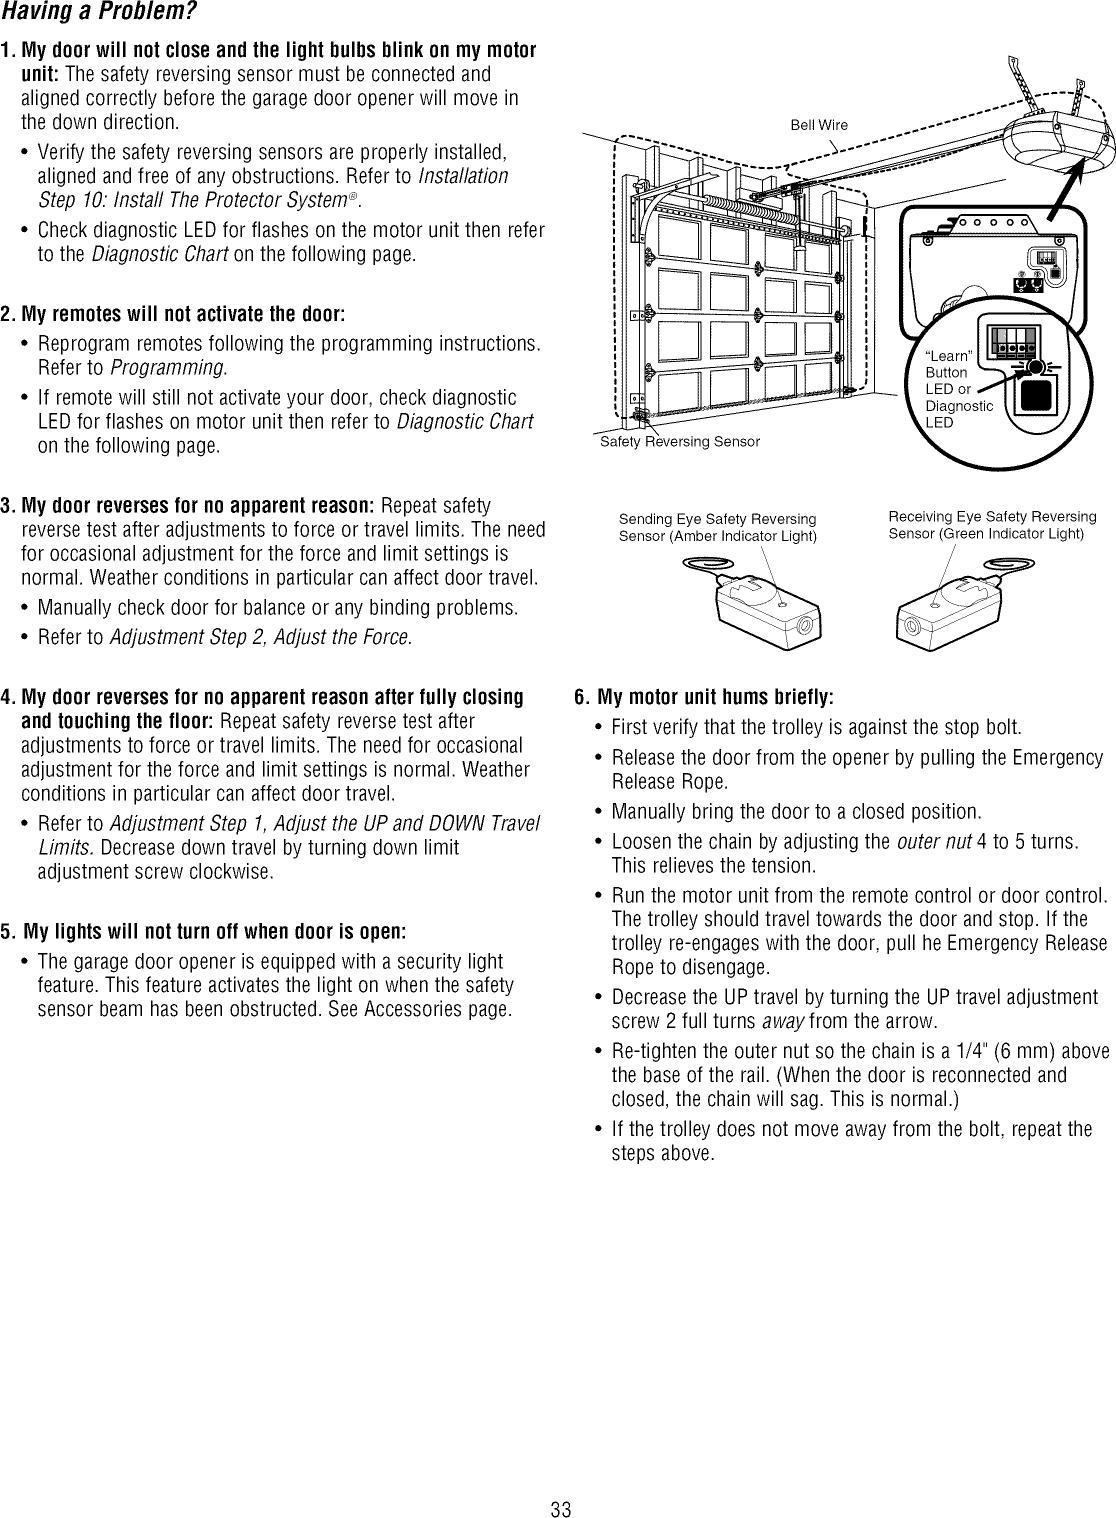 Garage Door Reverses After Closing Ideas Opener Safety Reversing Sensor Wiring Diagram Craftsman 13953901dm User Manual Manuals And Choice Image Design For Home